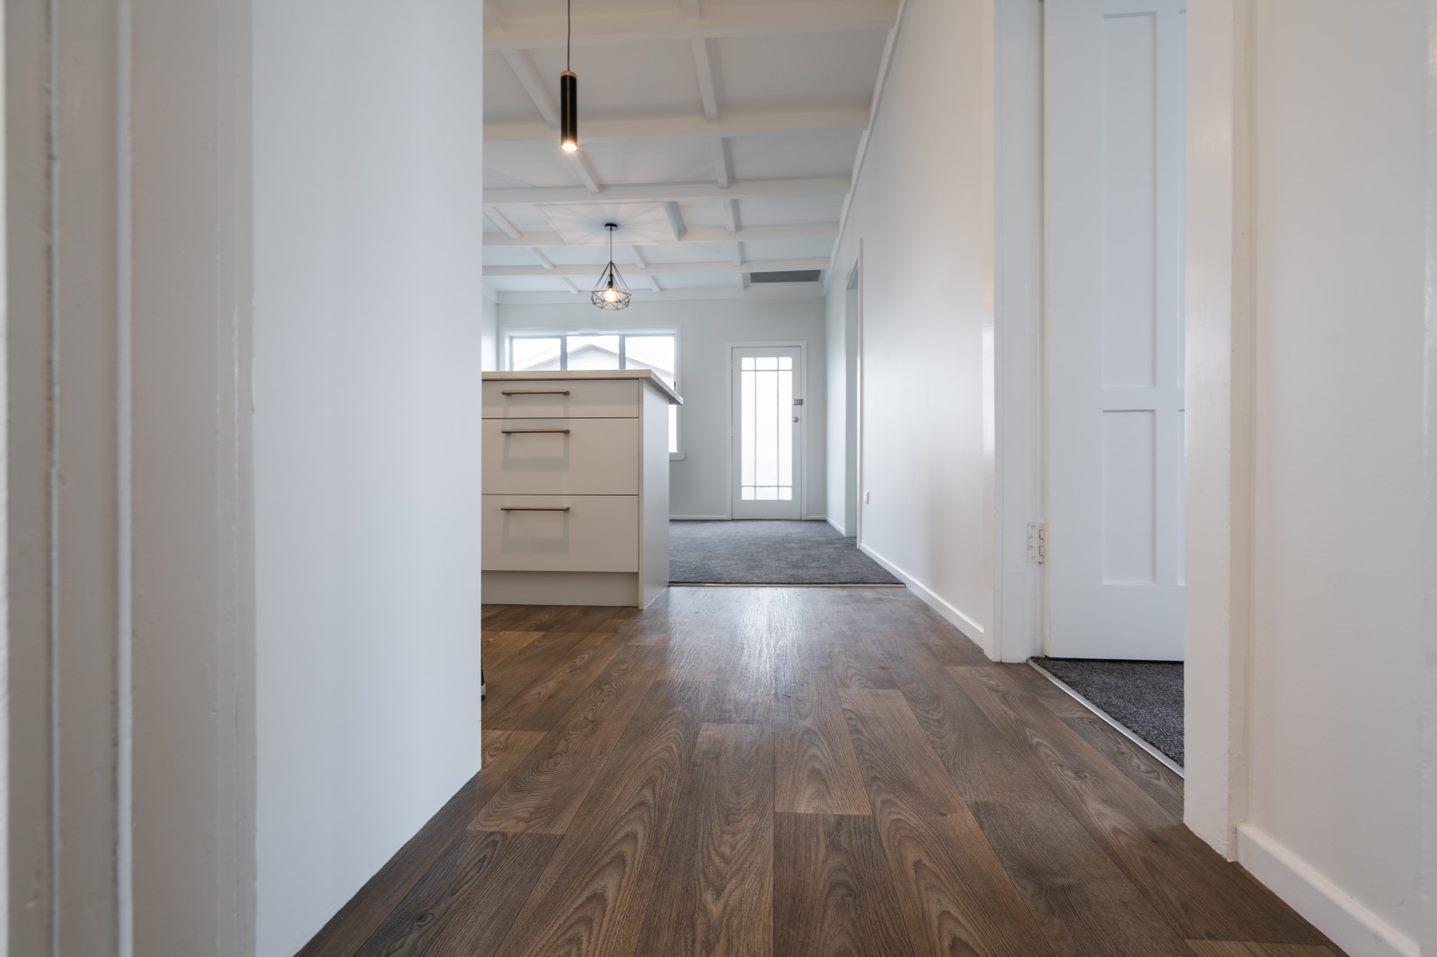 new vinyl flooring in Paptoetoe renovated home